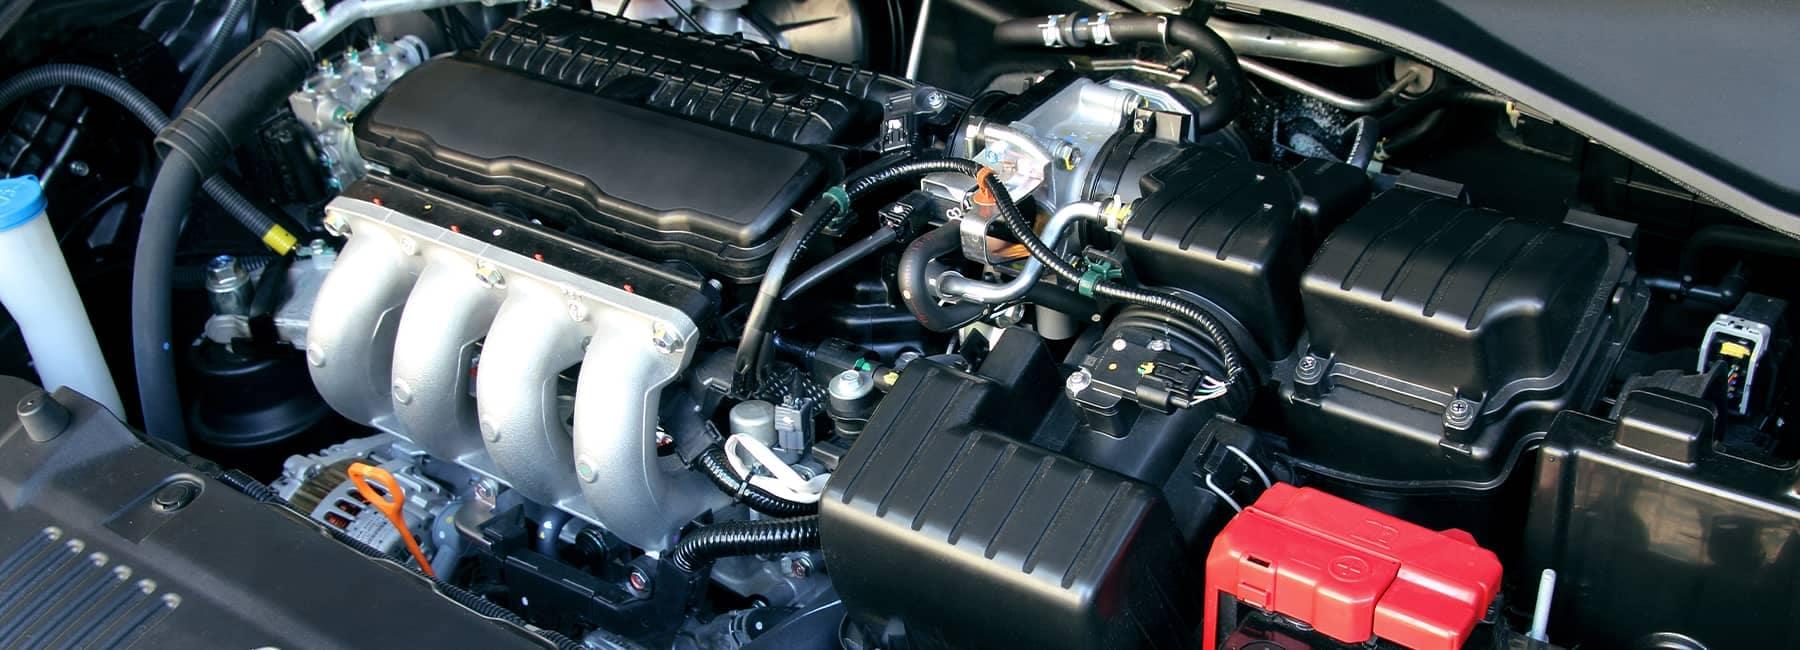 Car engine_mobile